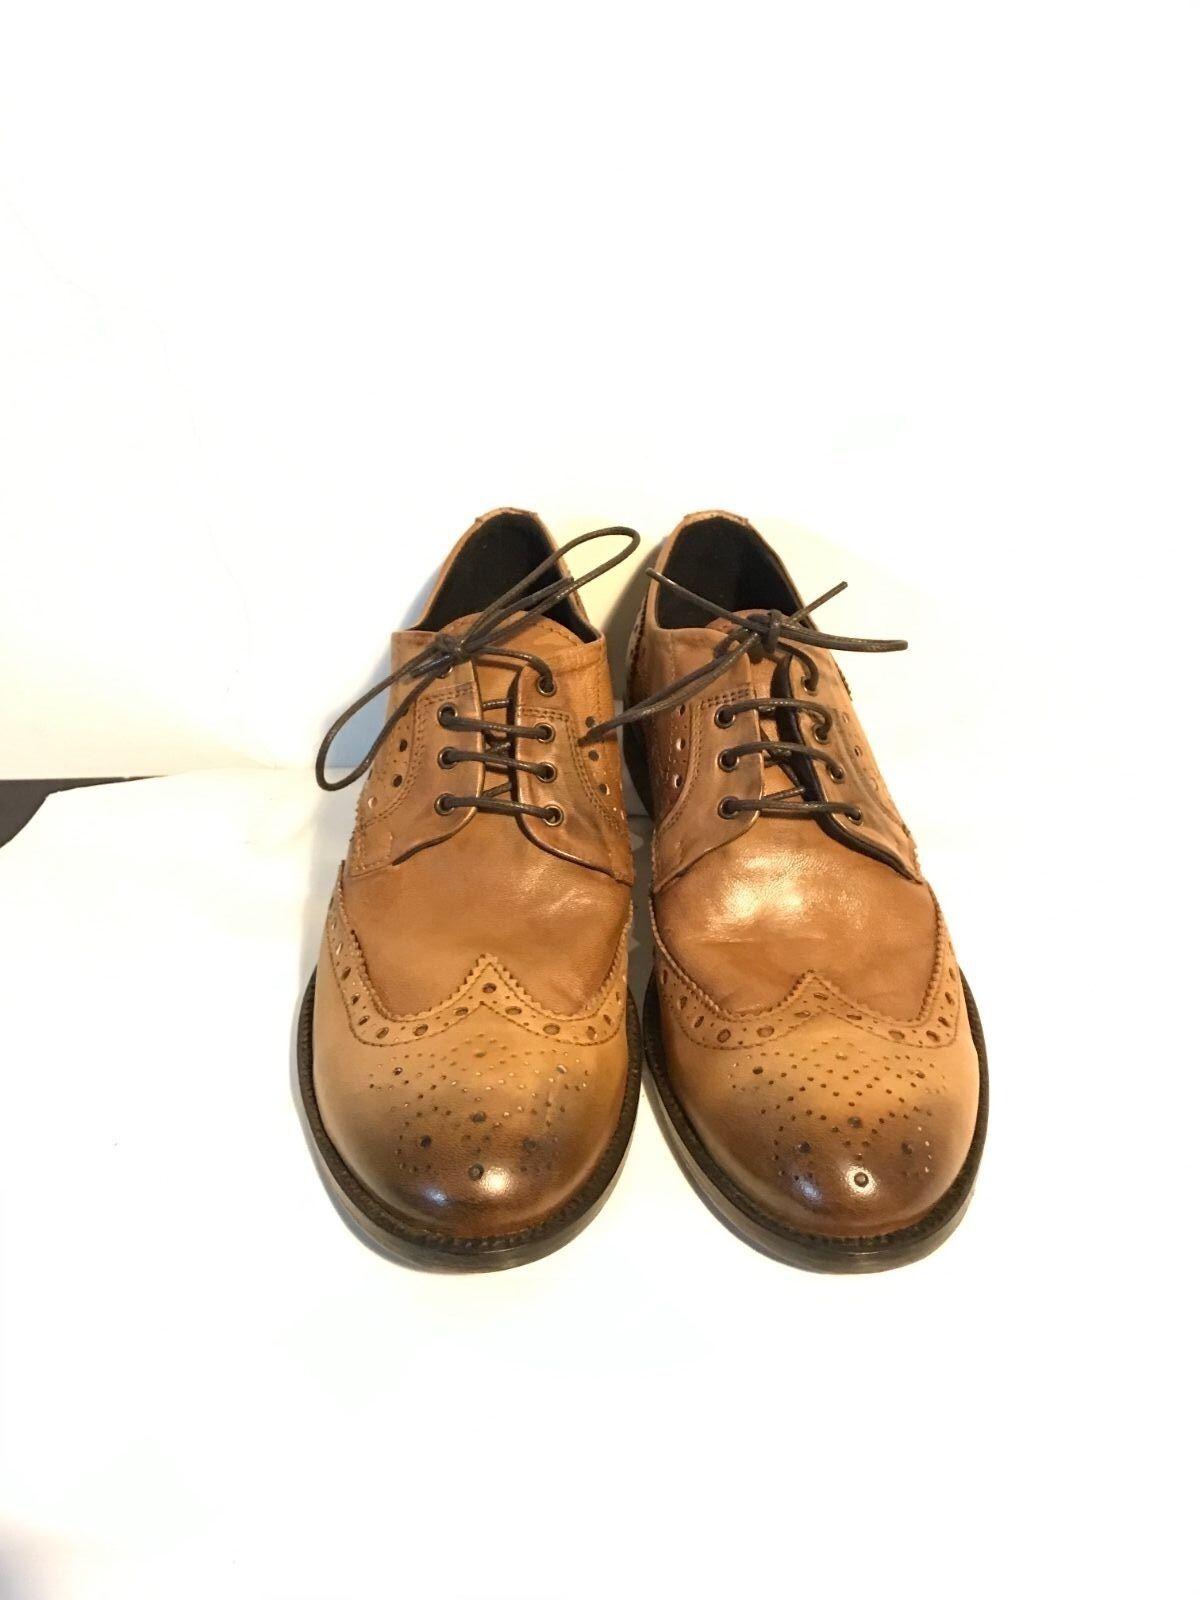 Prem1um scarpe classiche italy classic scarpe in made in scarpe italy classiche   b9abec